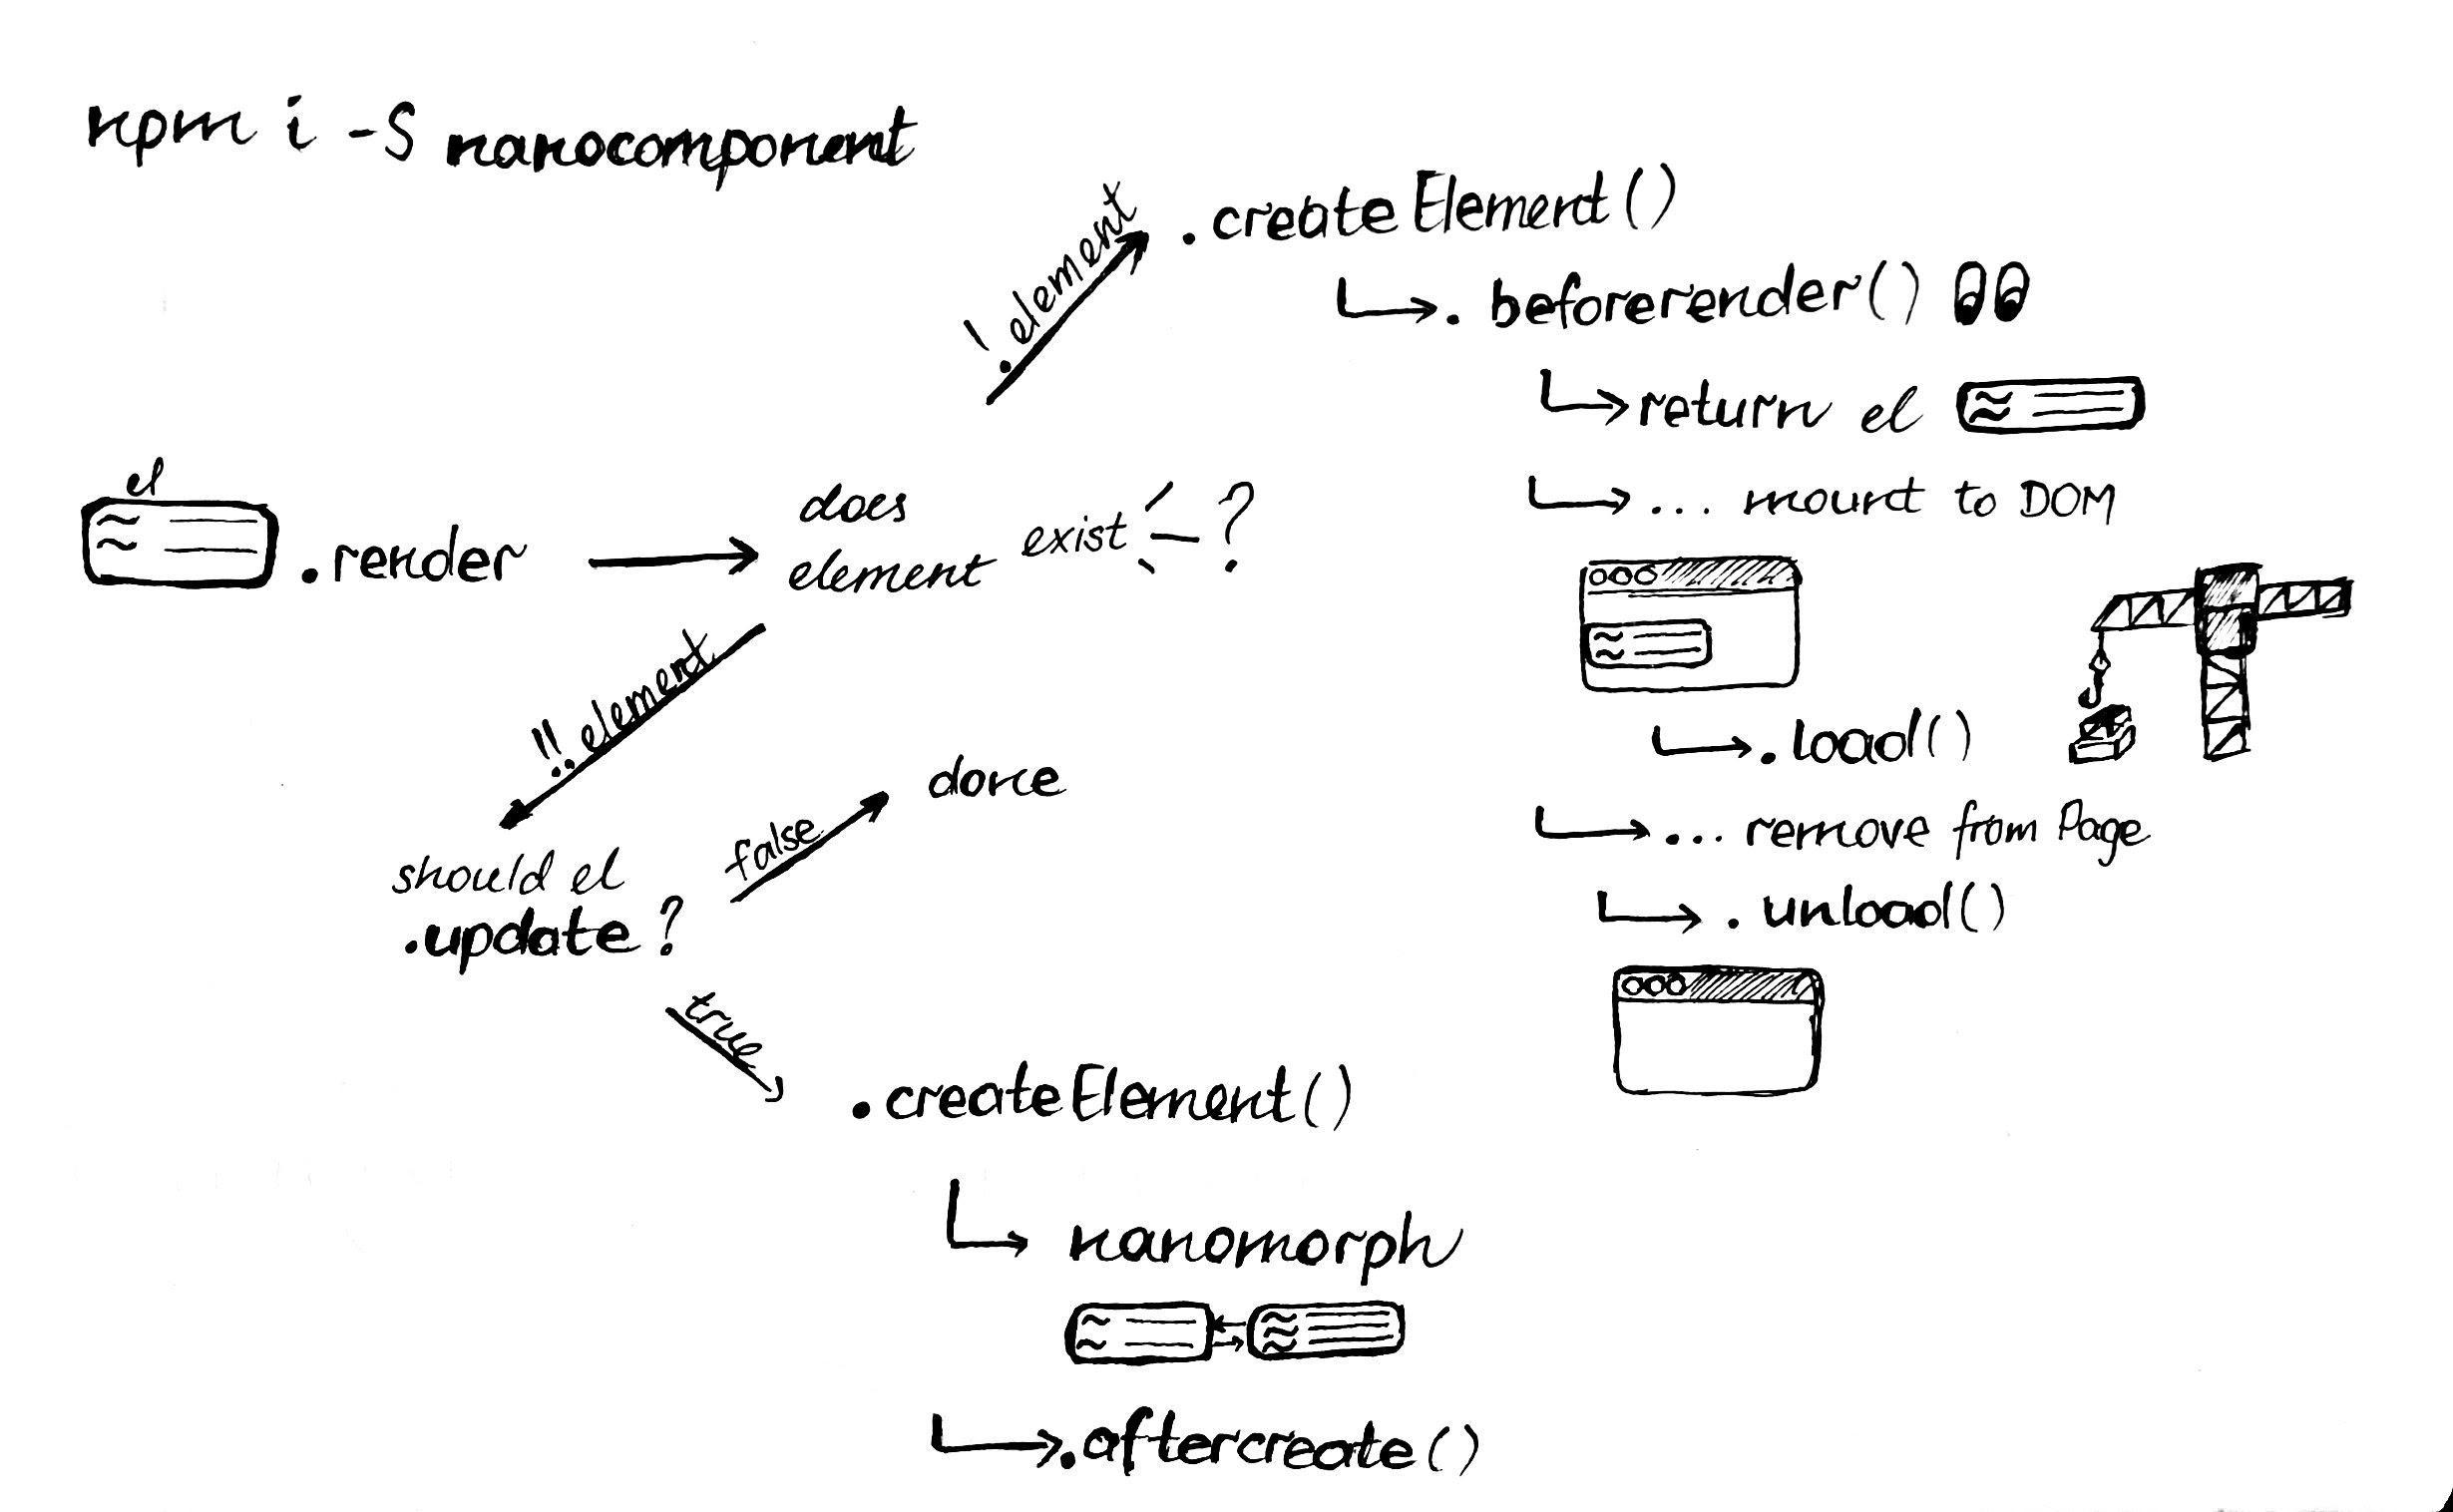 Lifecycle diagram